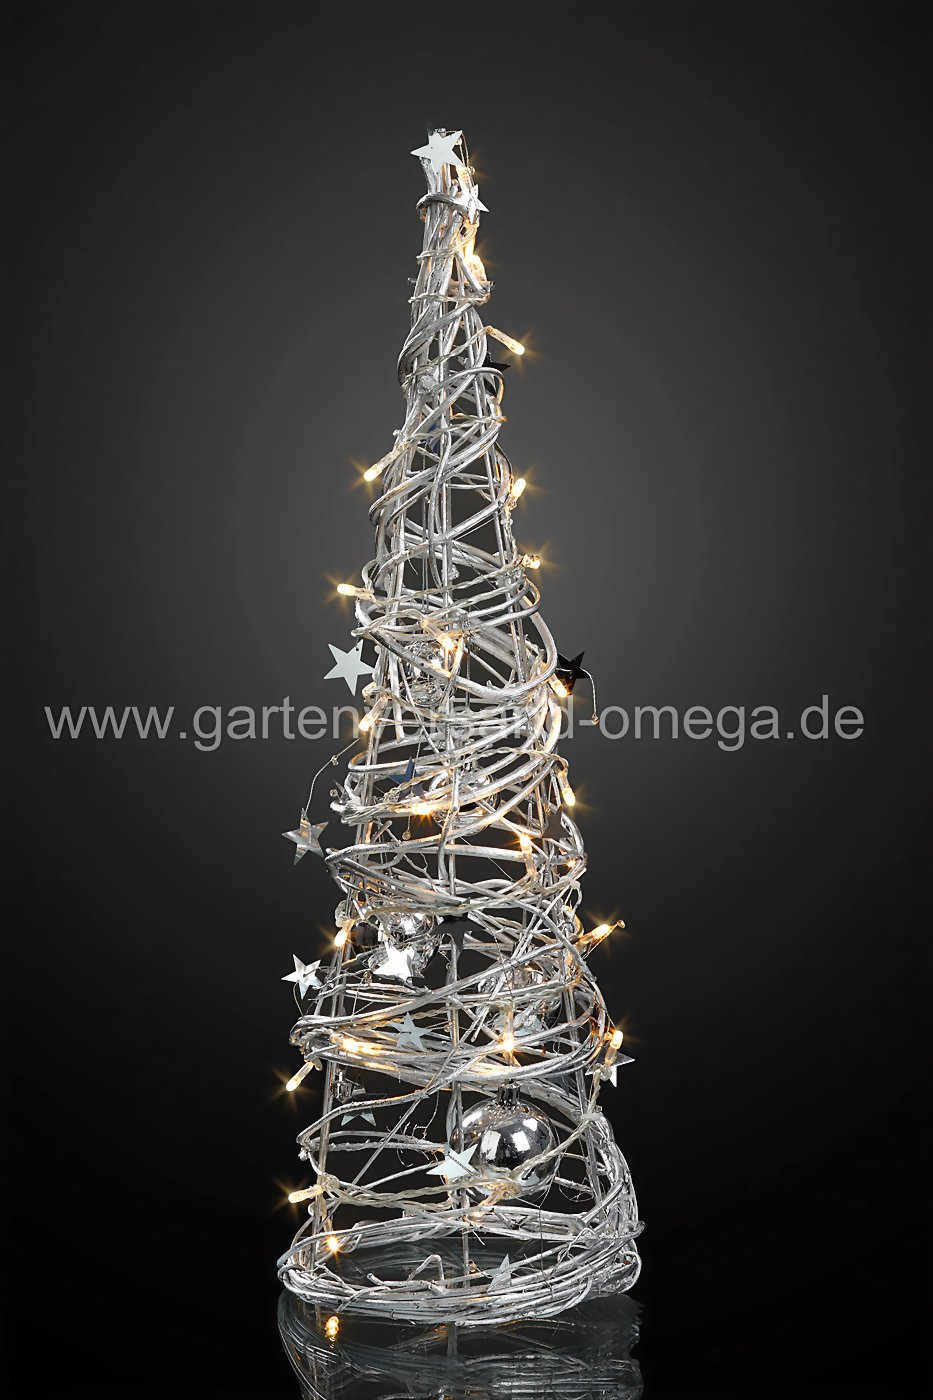 led pyramide mit silbernen kugeln weihnachtspyramide dekopyramide weihnachtstrend led. Black Bedroom Furniture Sets. Home Design Ideas